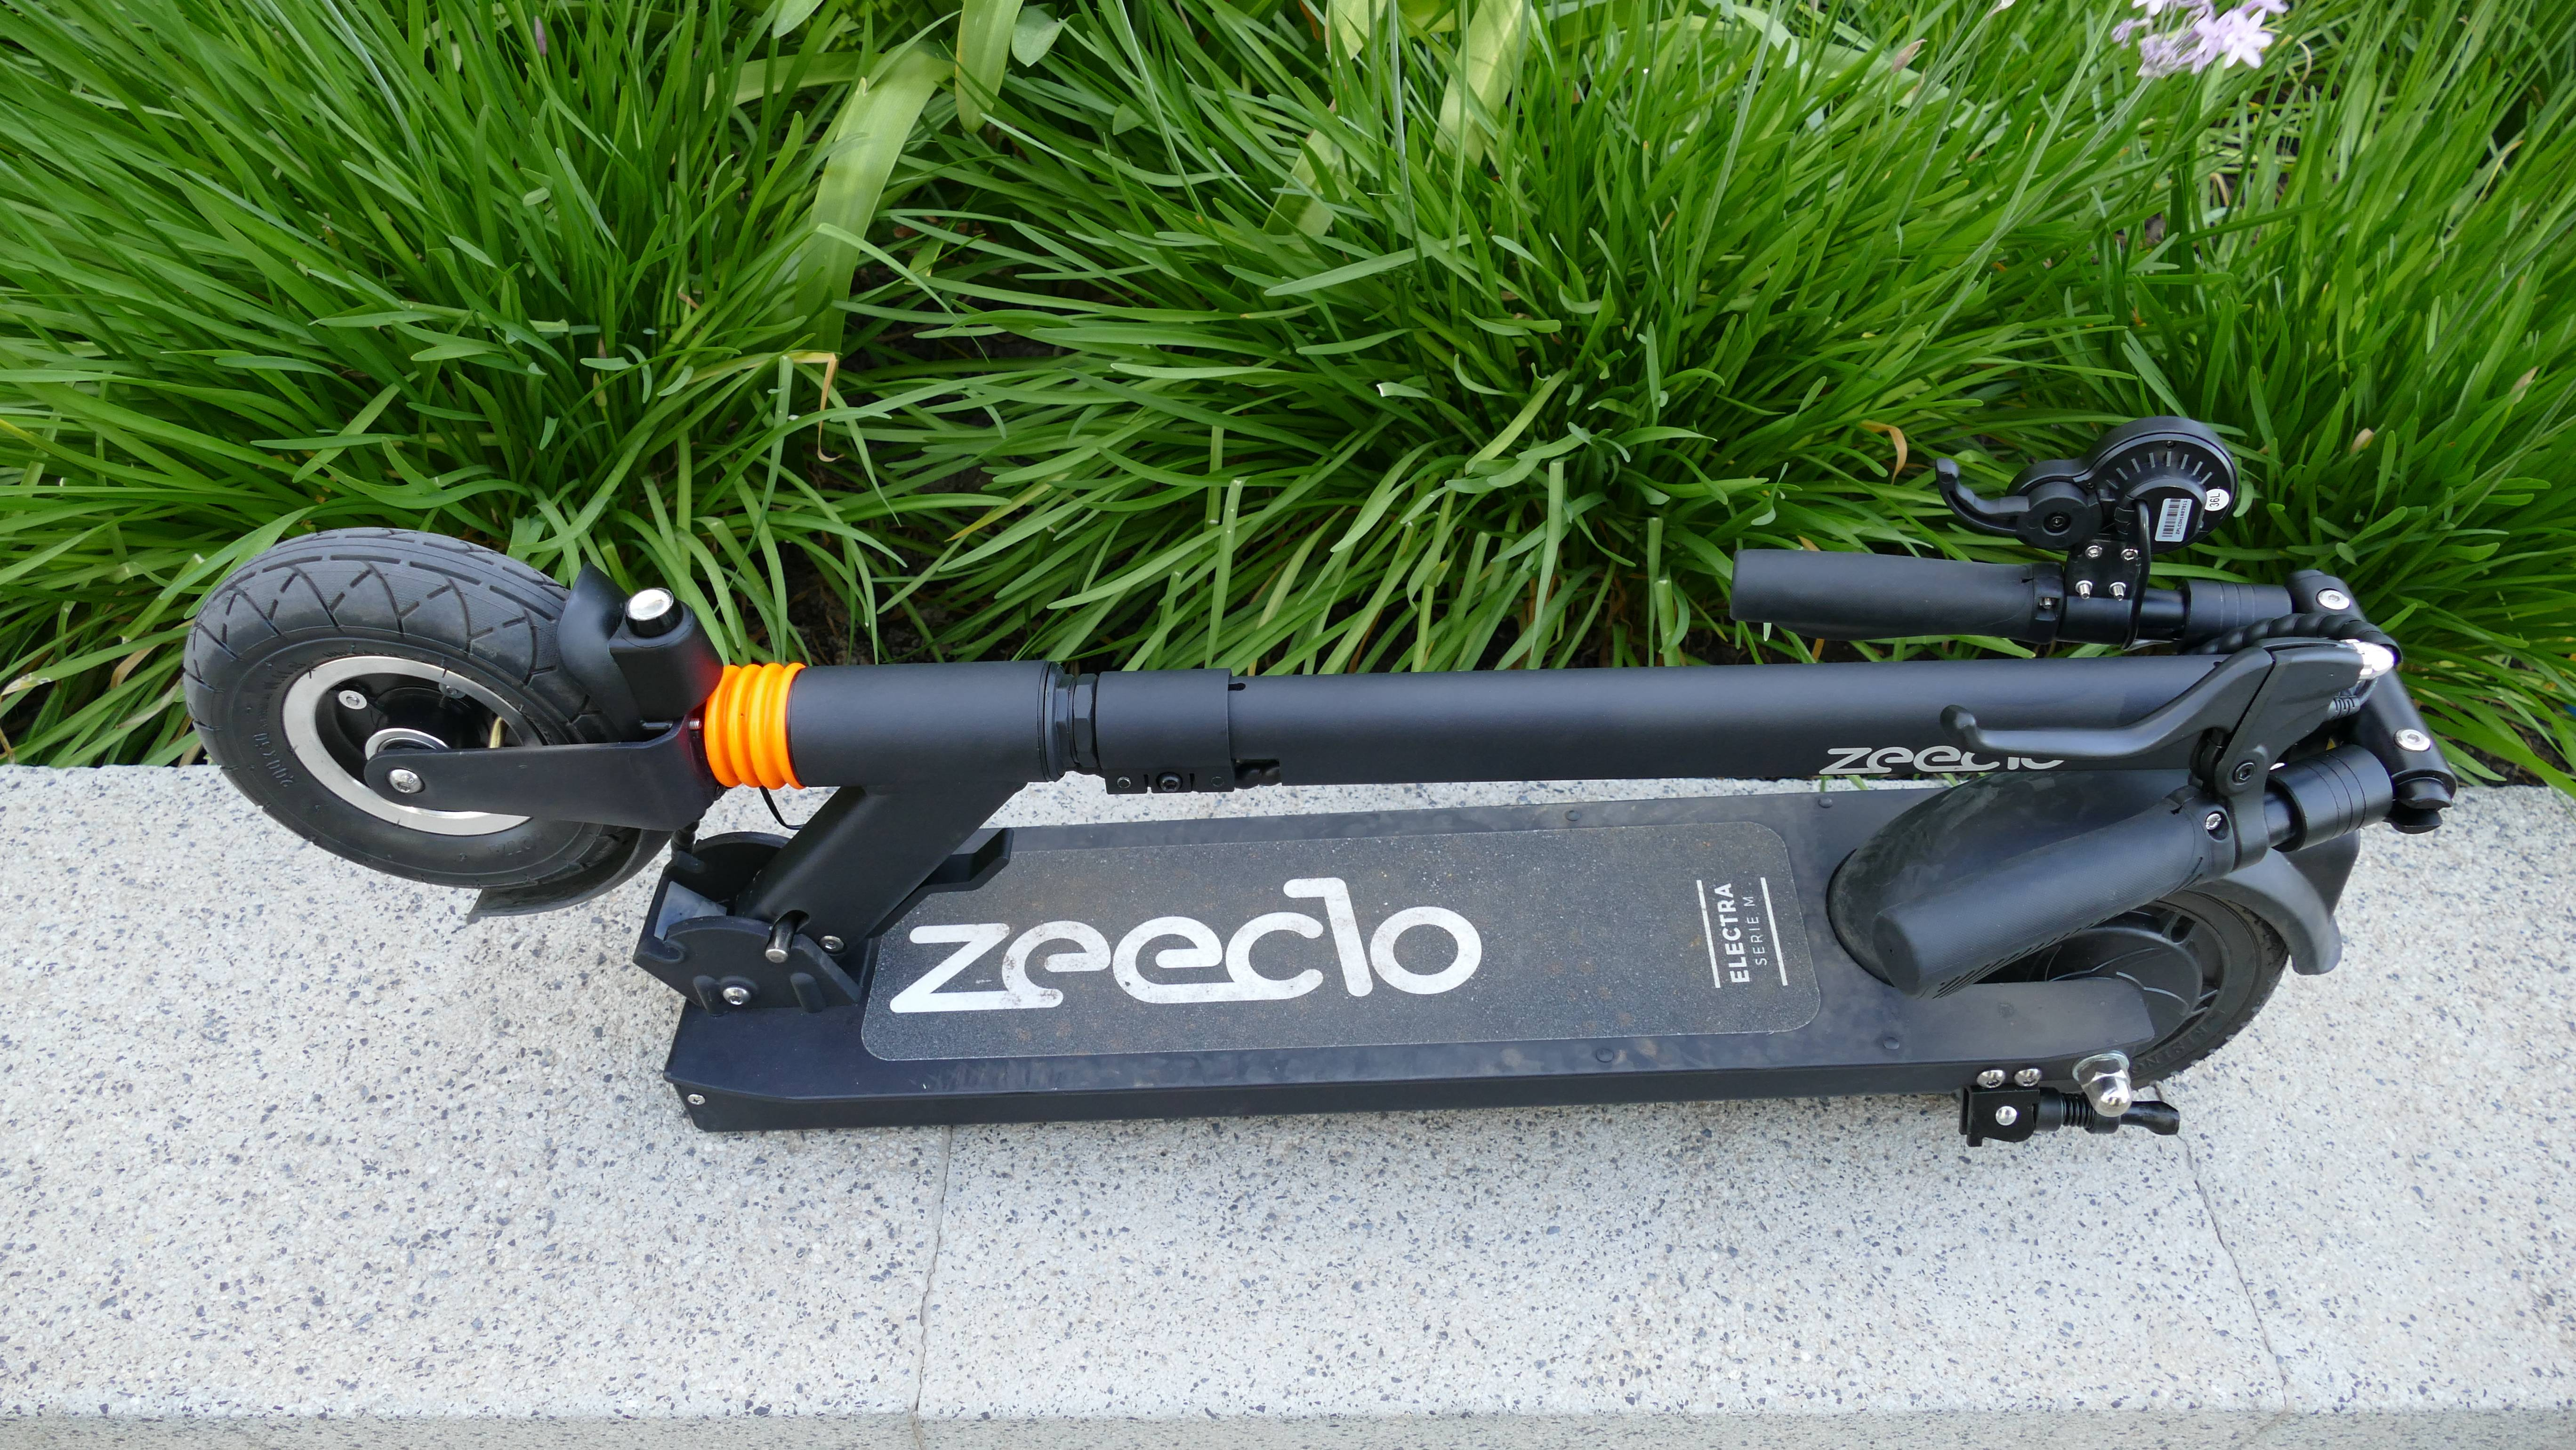 Zeeclo Elektra scooter